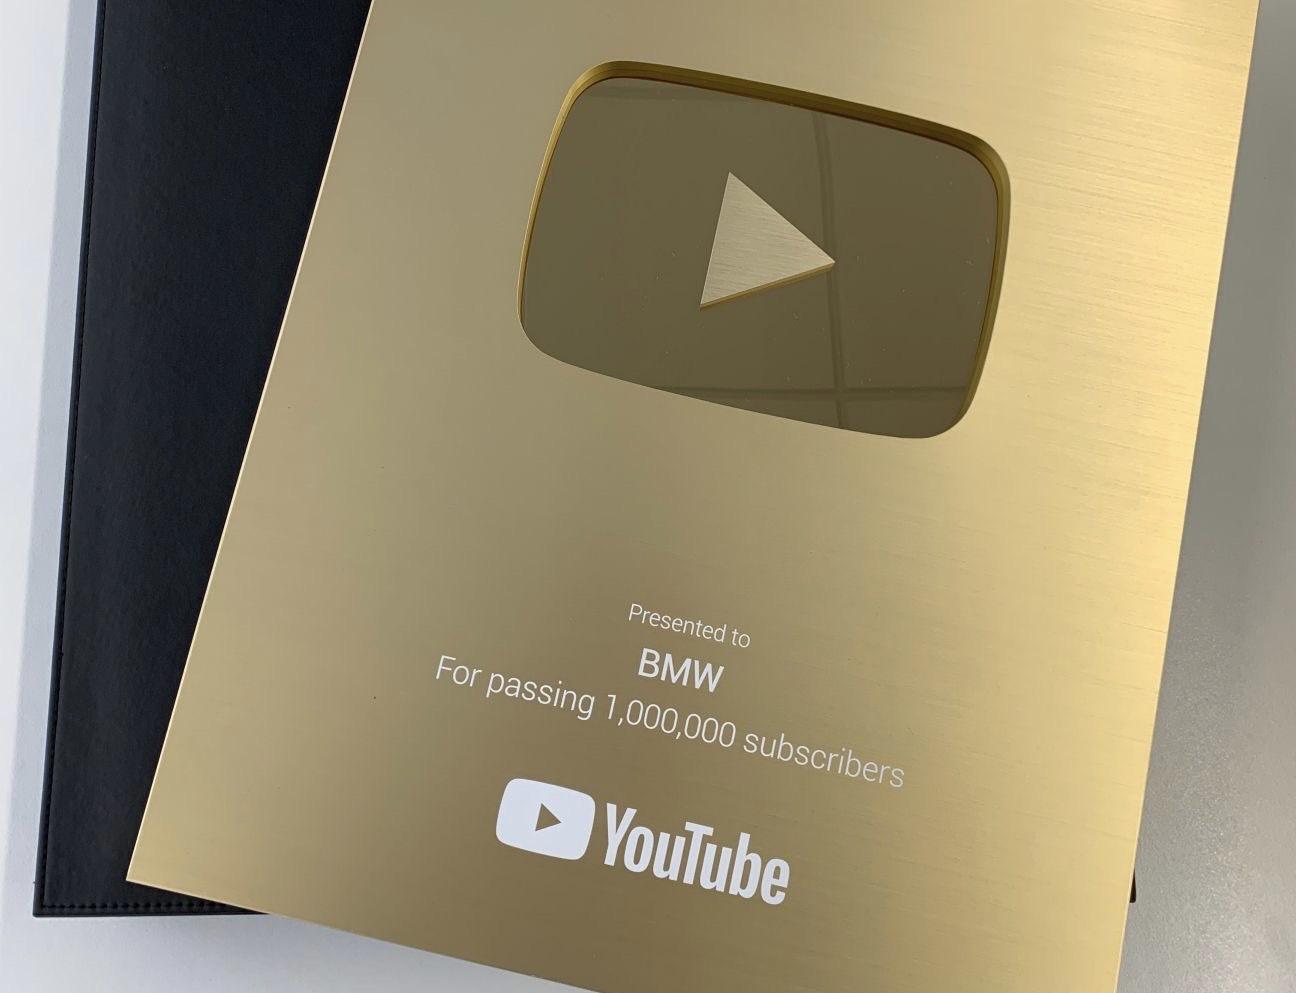 #NEXTGen2020 BMW Golden Button Award youtube